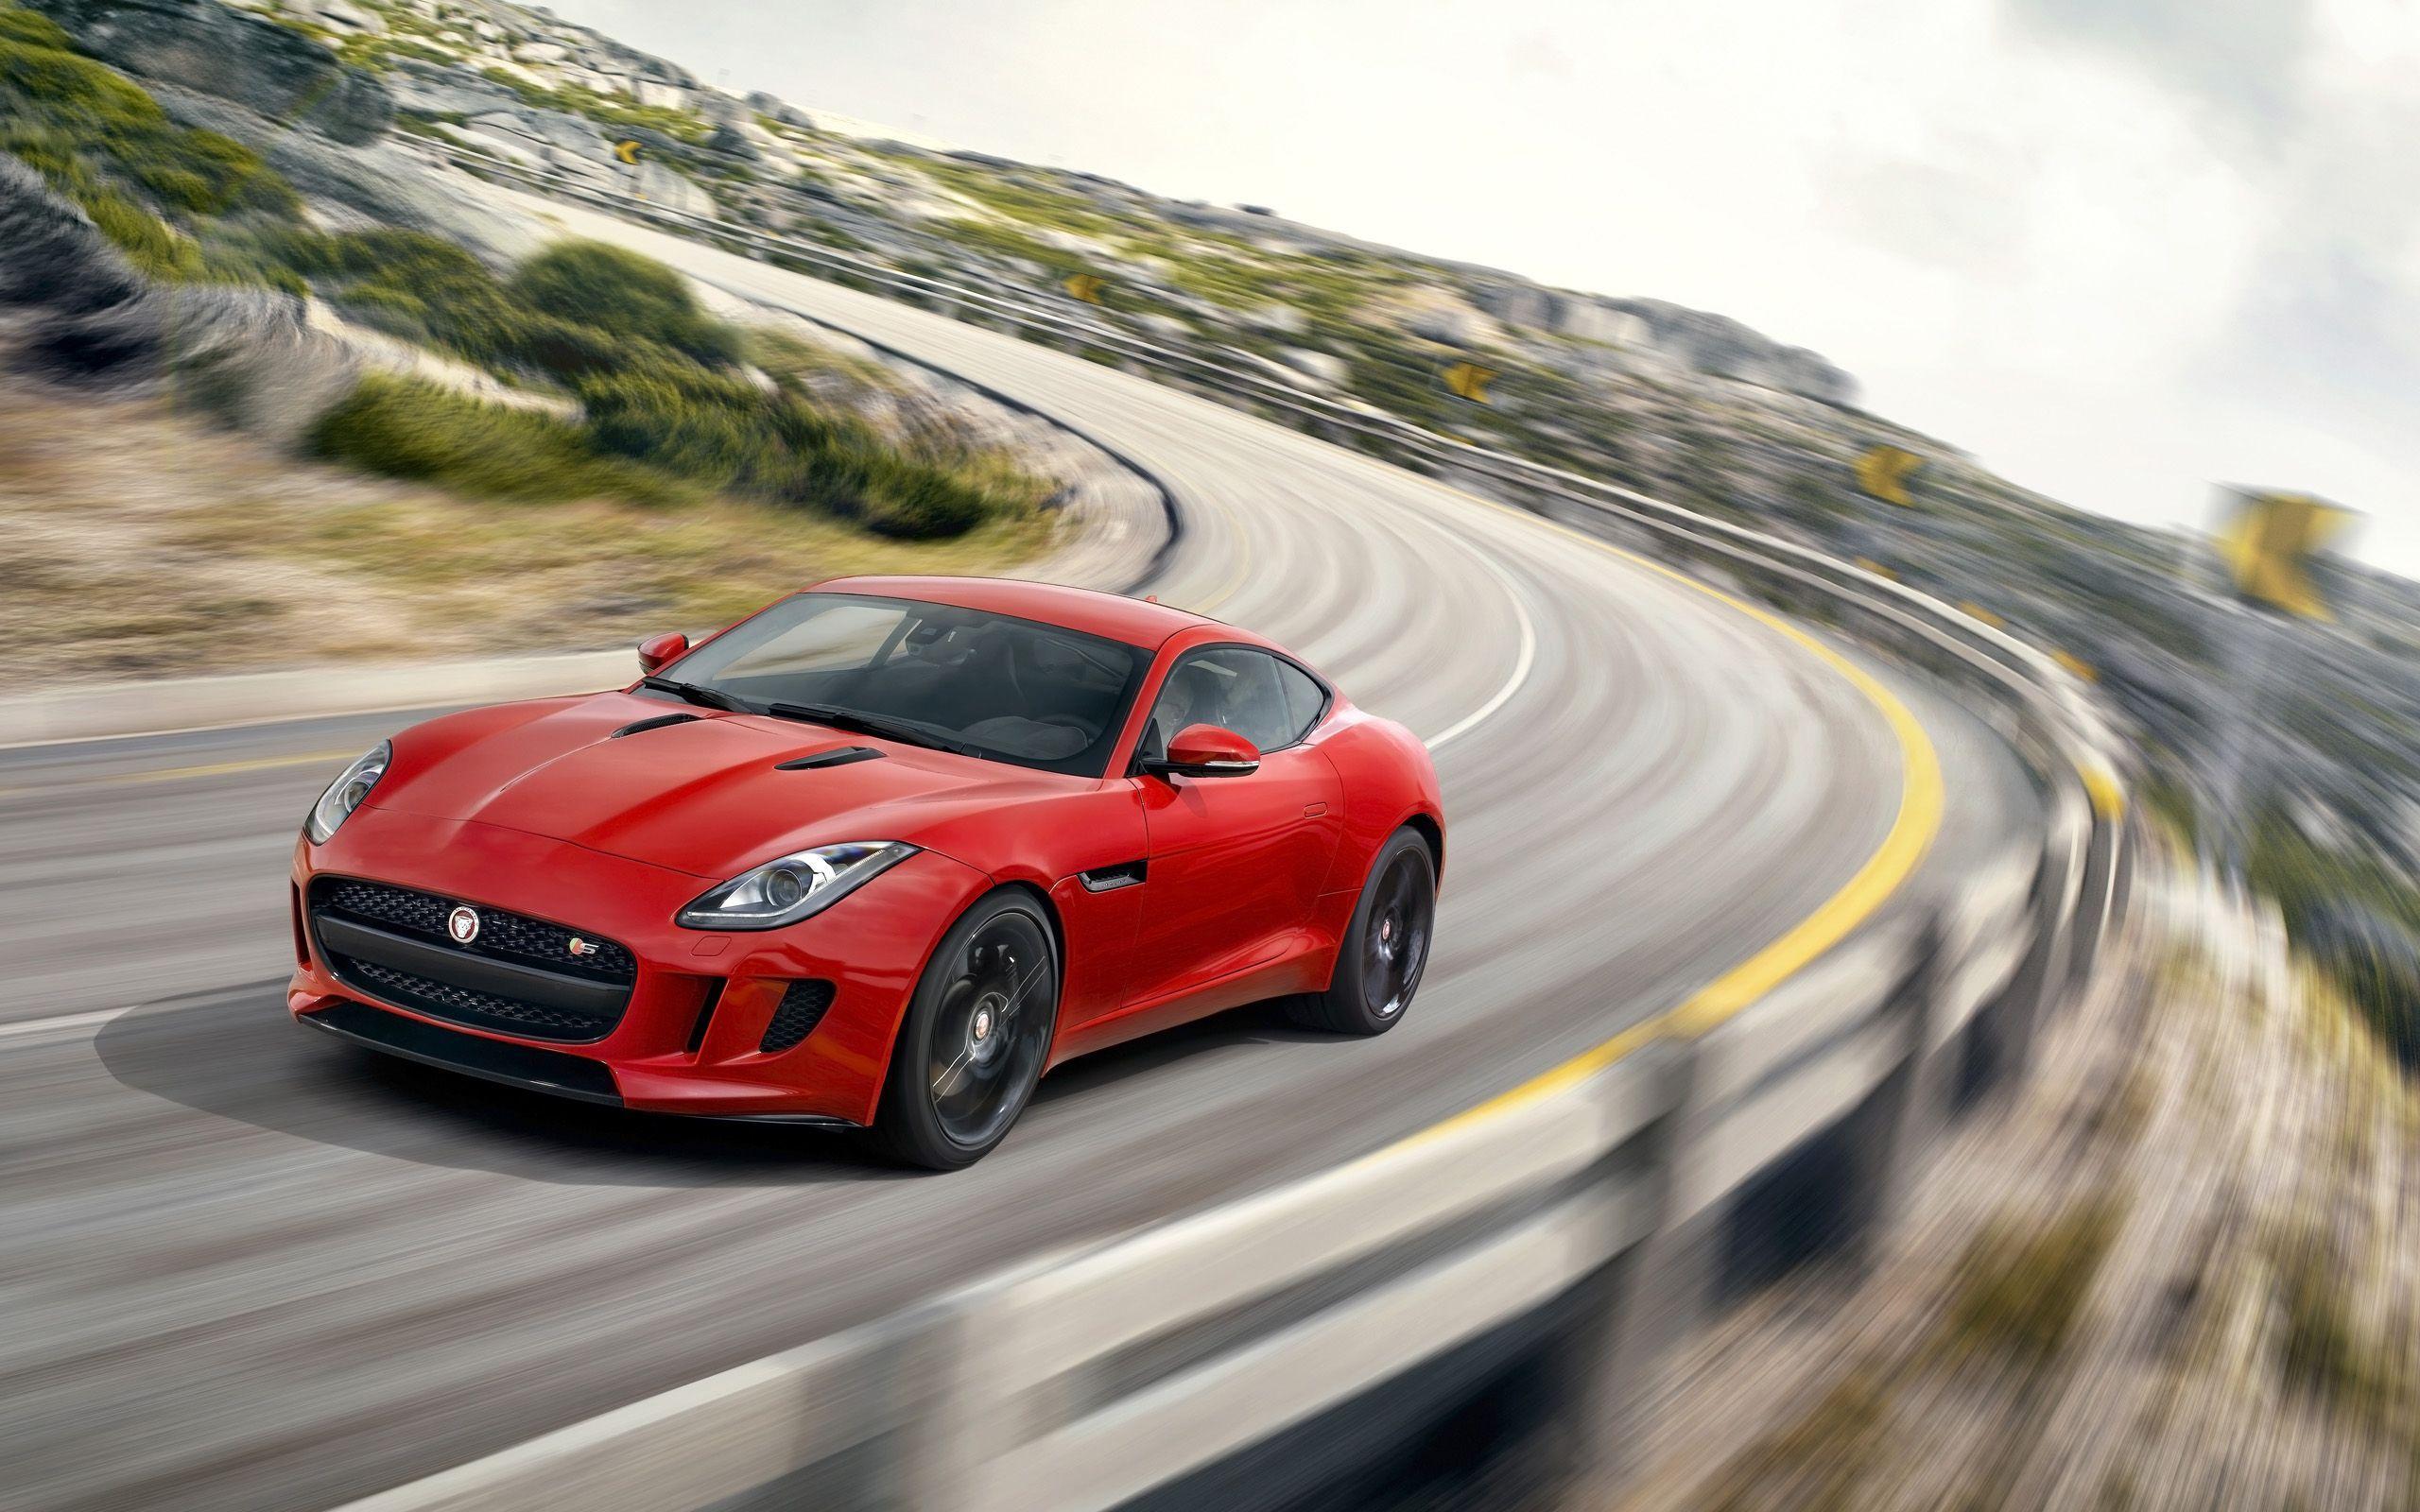 Red Jaguar Wallpapers Top Free Red Jaguar Backgrounds Wallpaperaccess